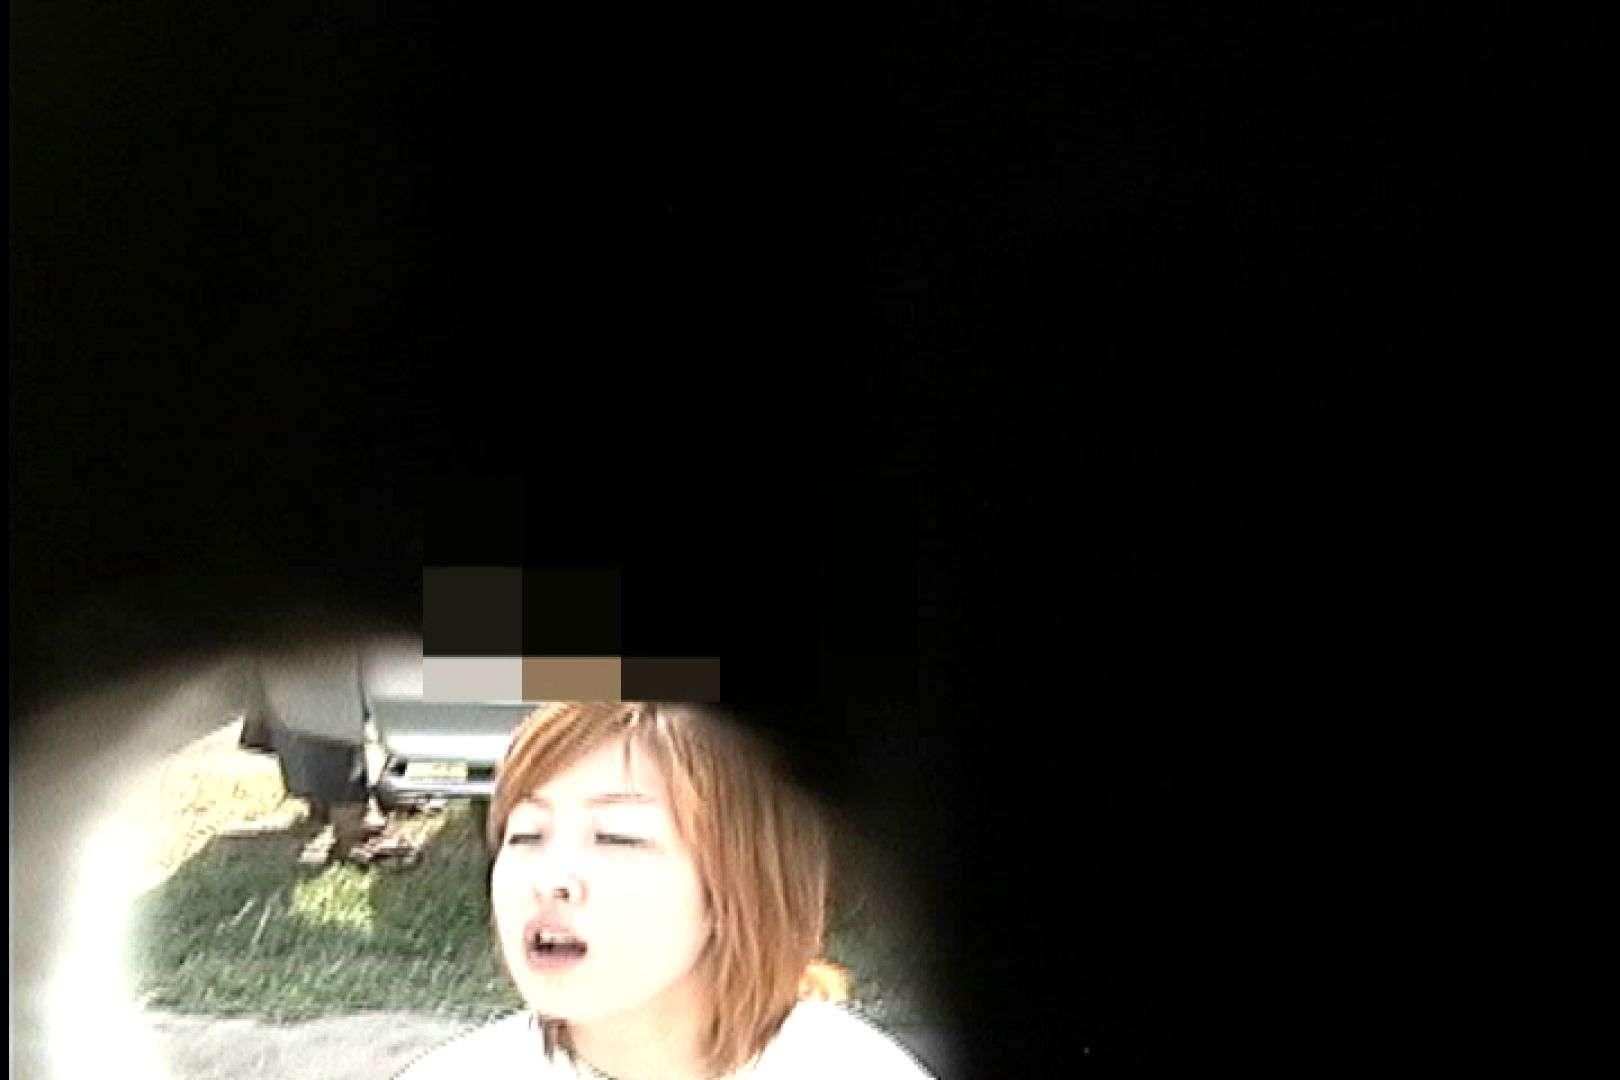 No.41 陰茎から滴り落ちる水滴 ギャルズ オマンコ無修正動画無料 86画像 2